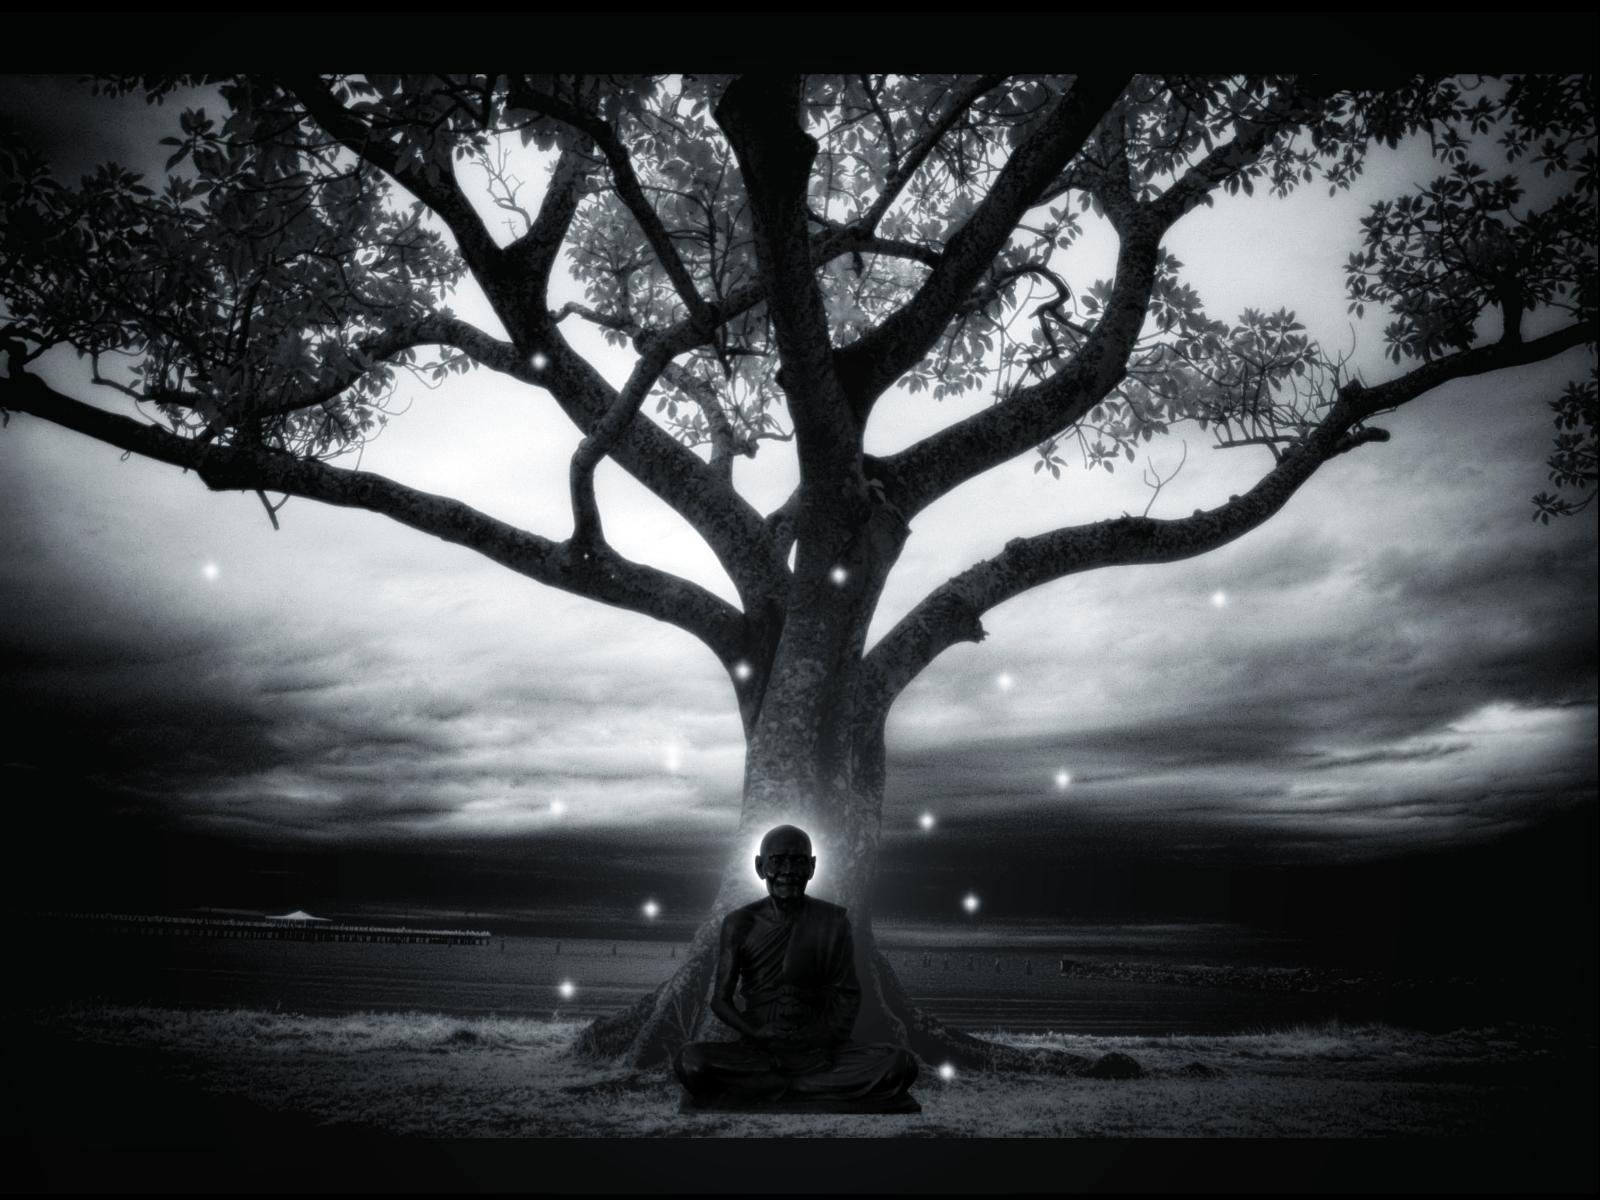 in_meditation____by_knotty82.jpg